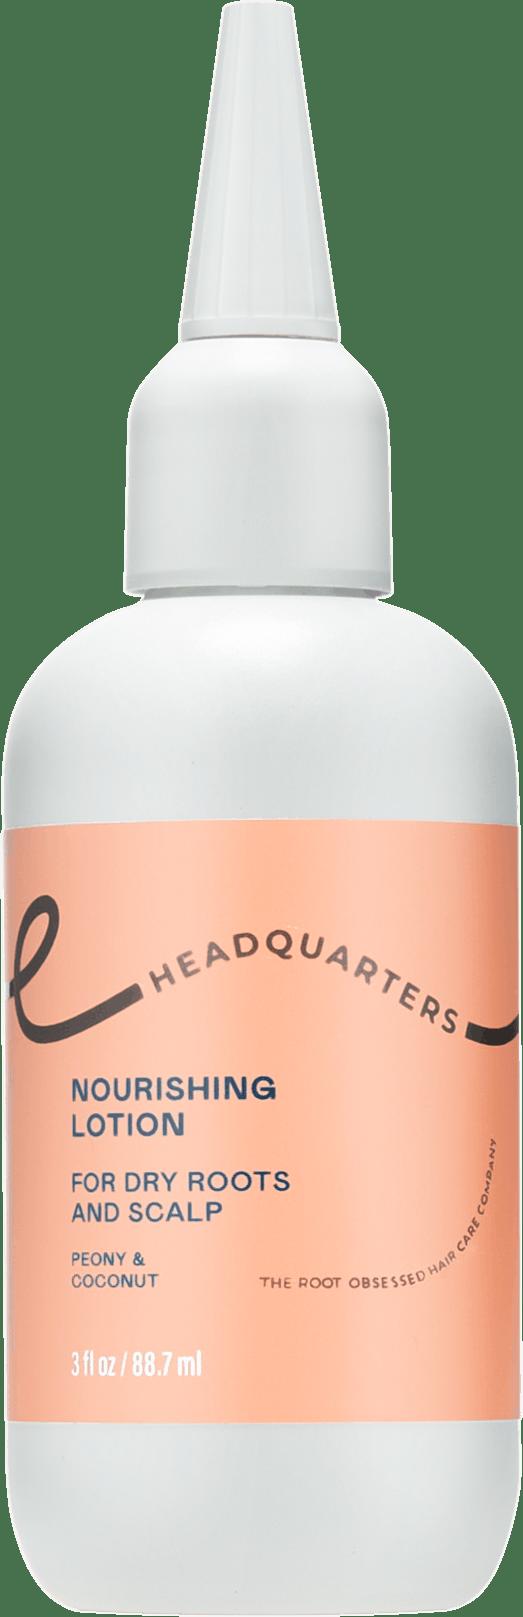 Headquarters Nourishing Lotion Dry scalp care bottle